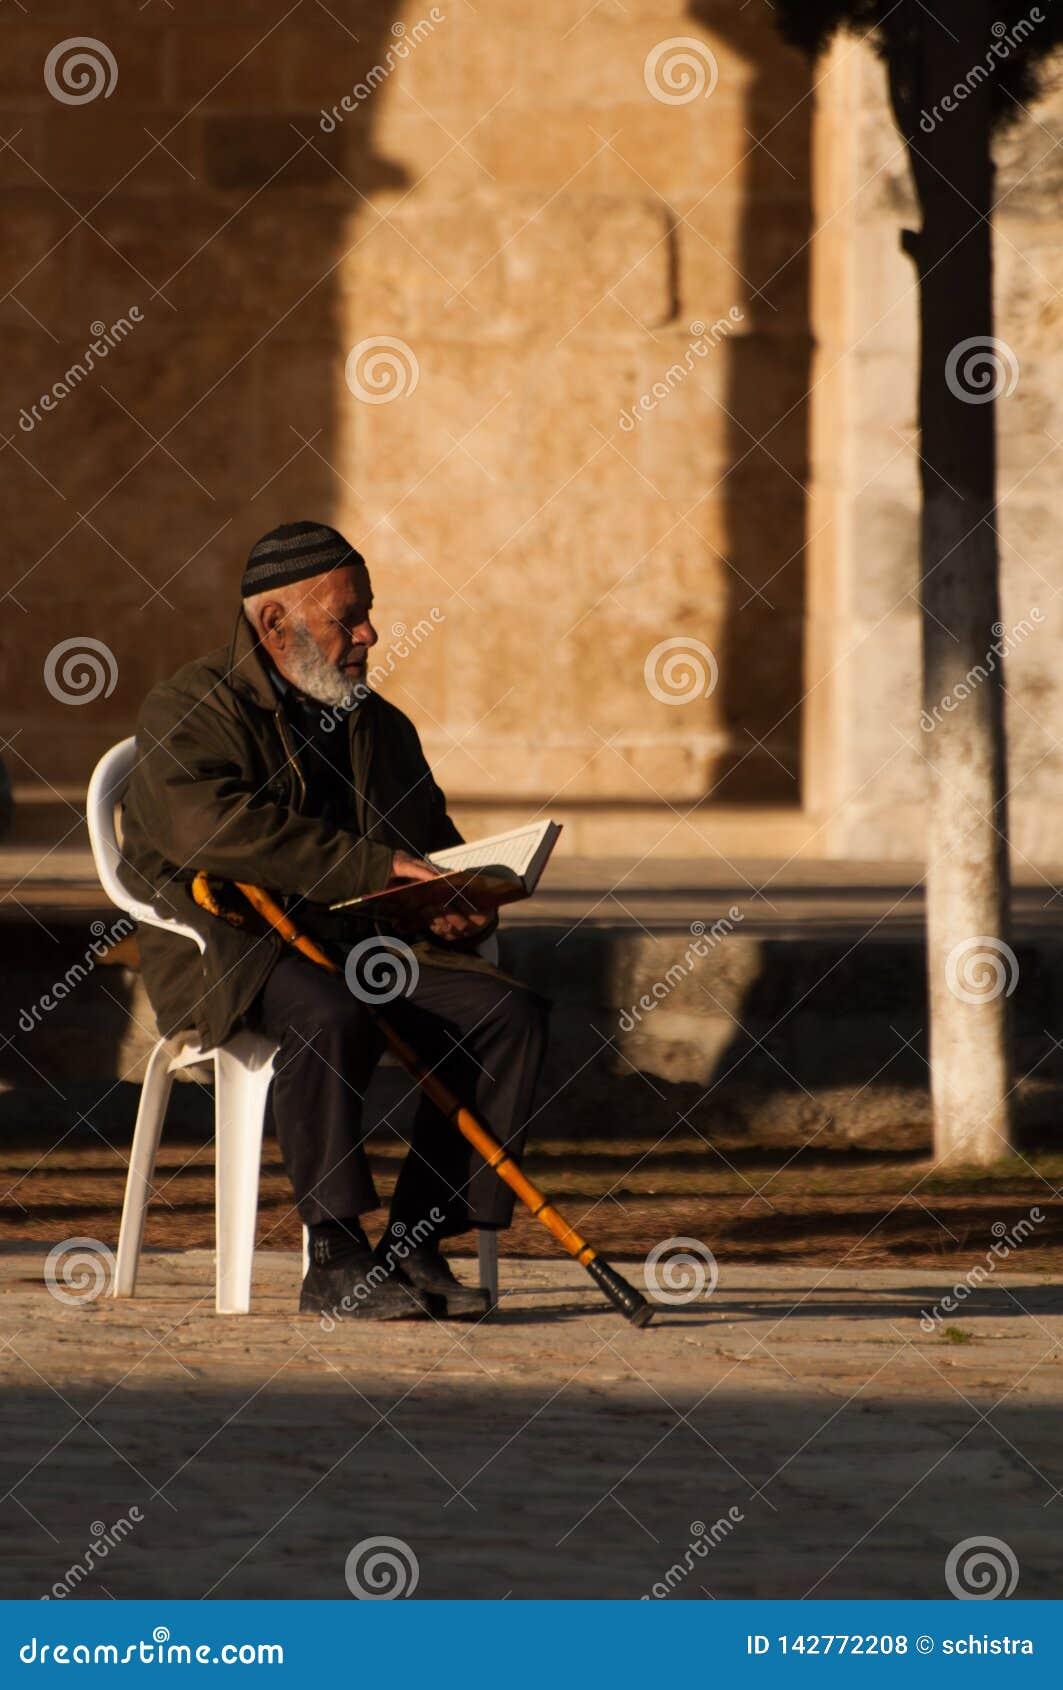 Jerusalem, December 2012: Elderly man prays at the Mount Temple in Jerusalem, Israel